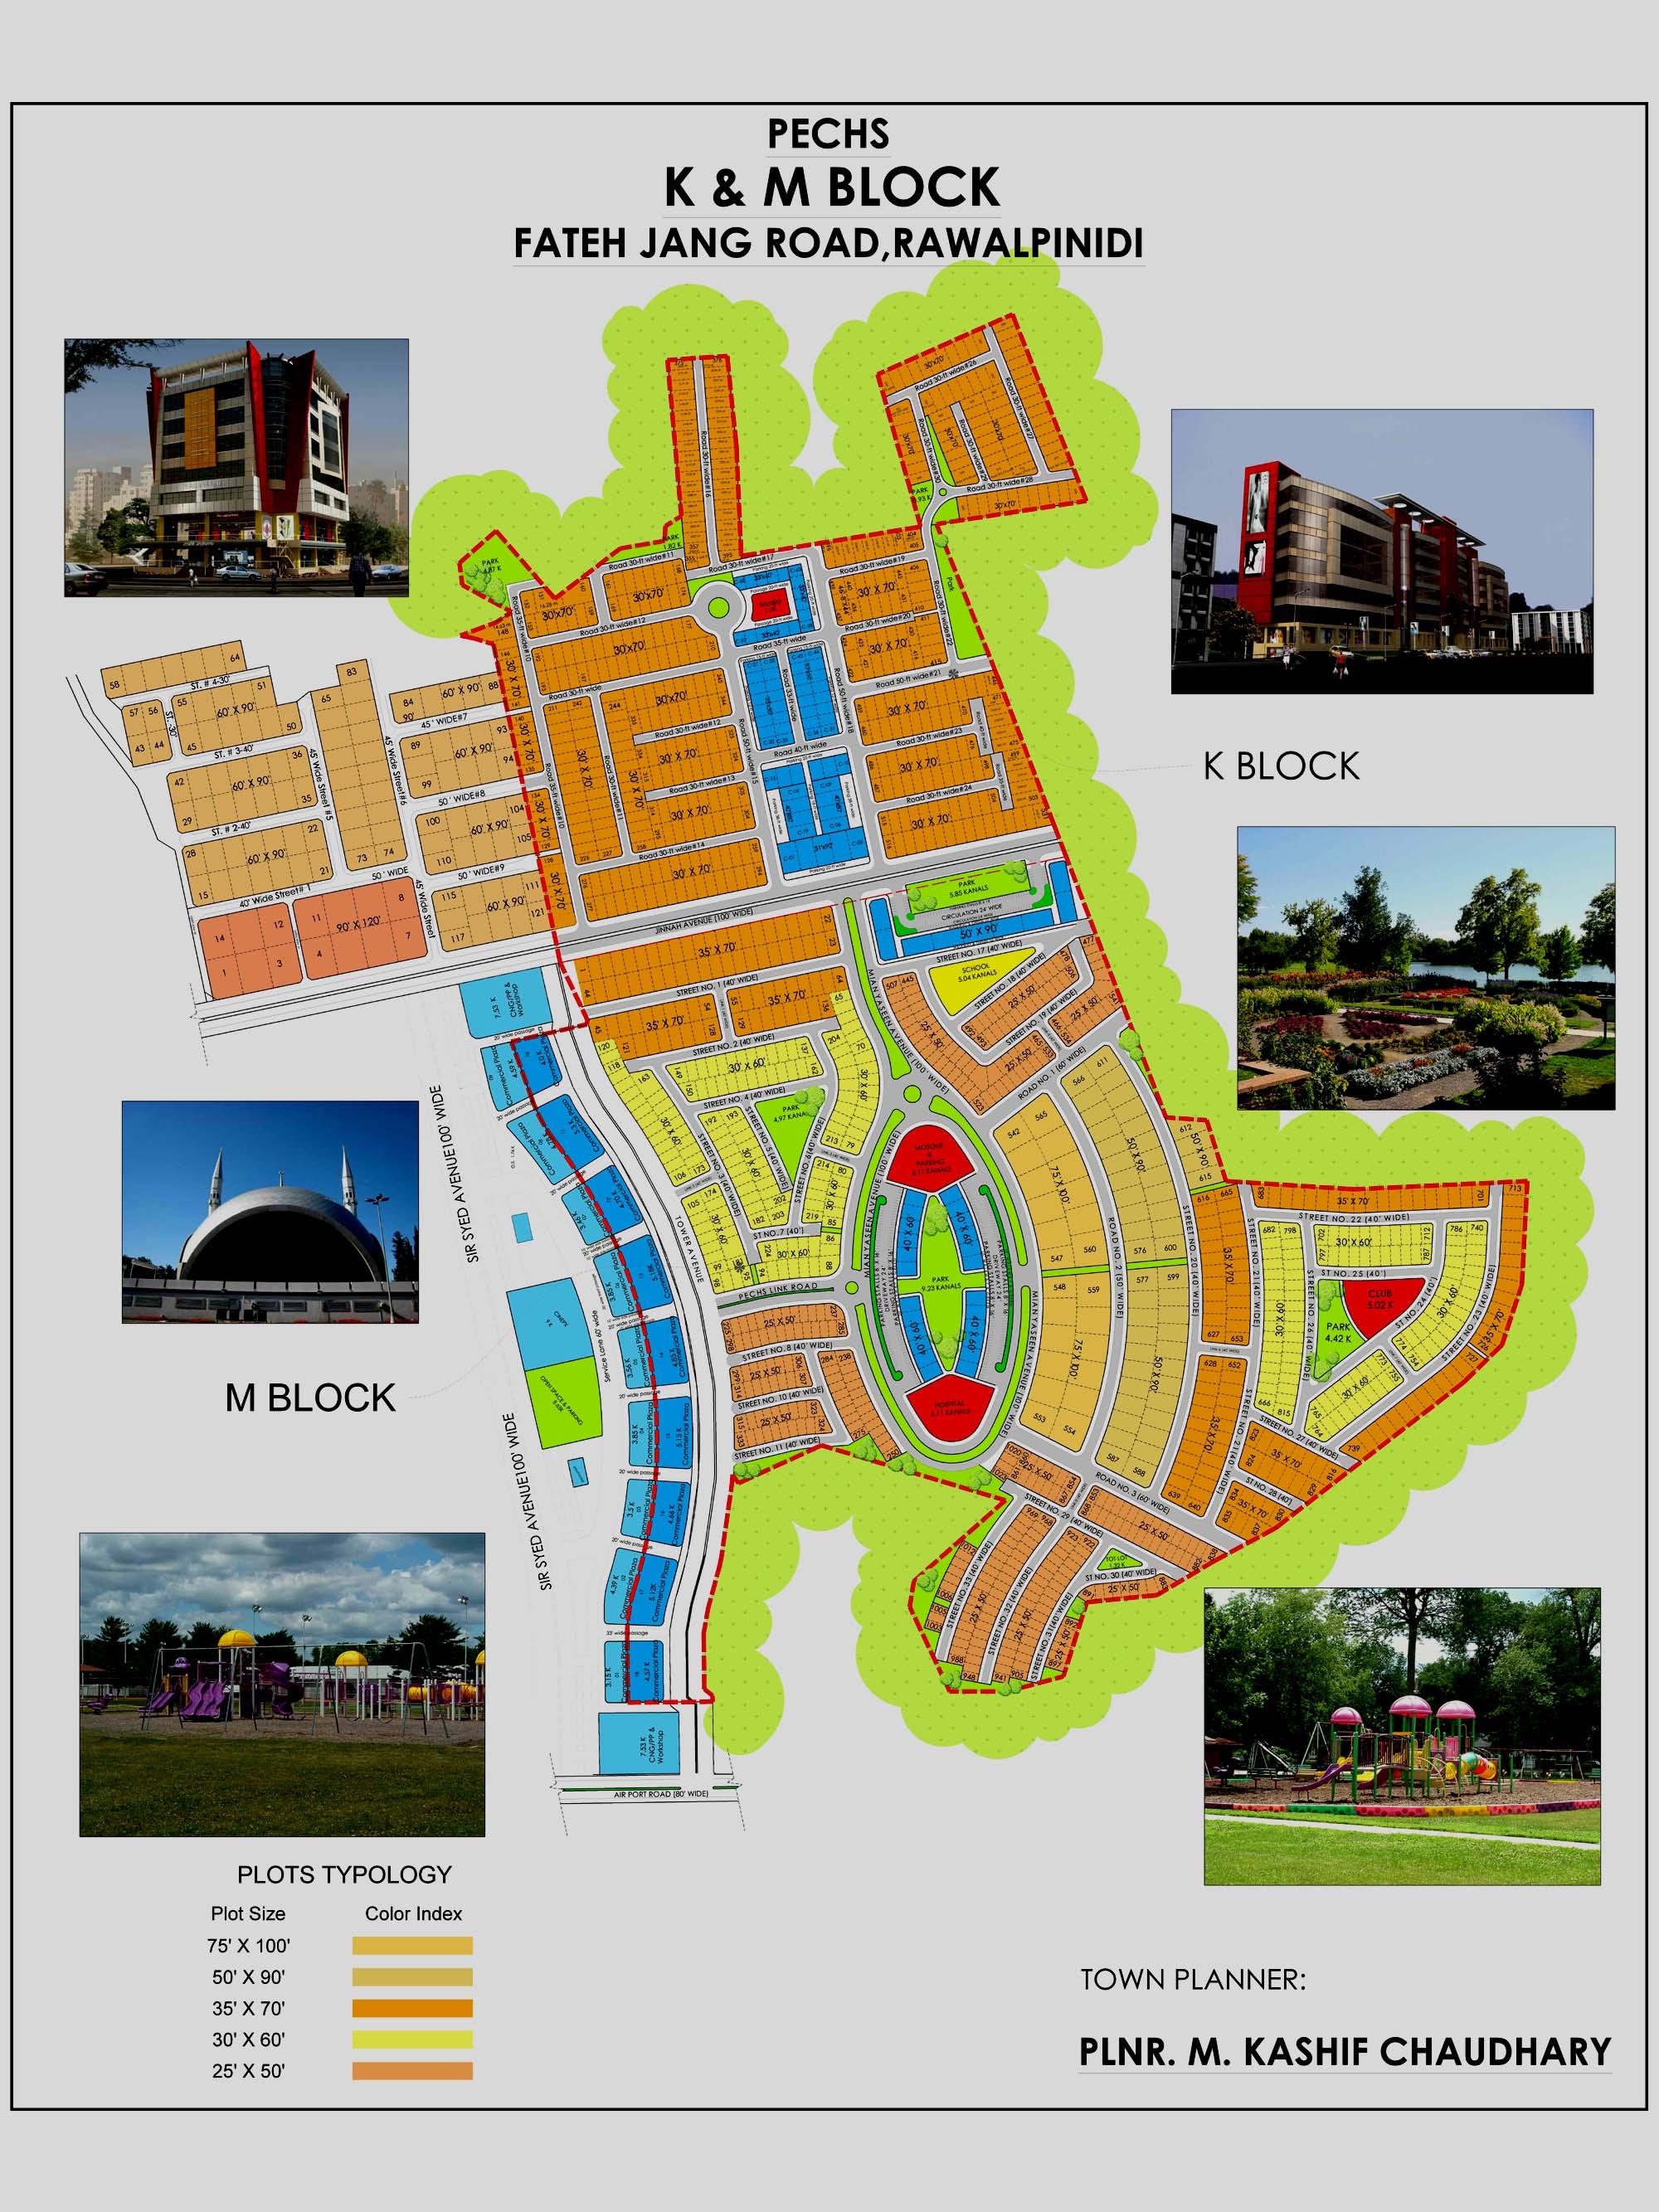 110 Punch Down Block Wiring Diagram Pechs Islamabad Maps Manahil Estate